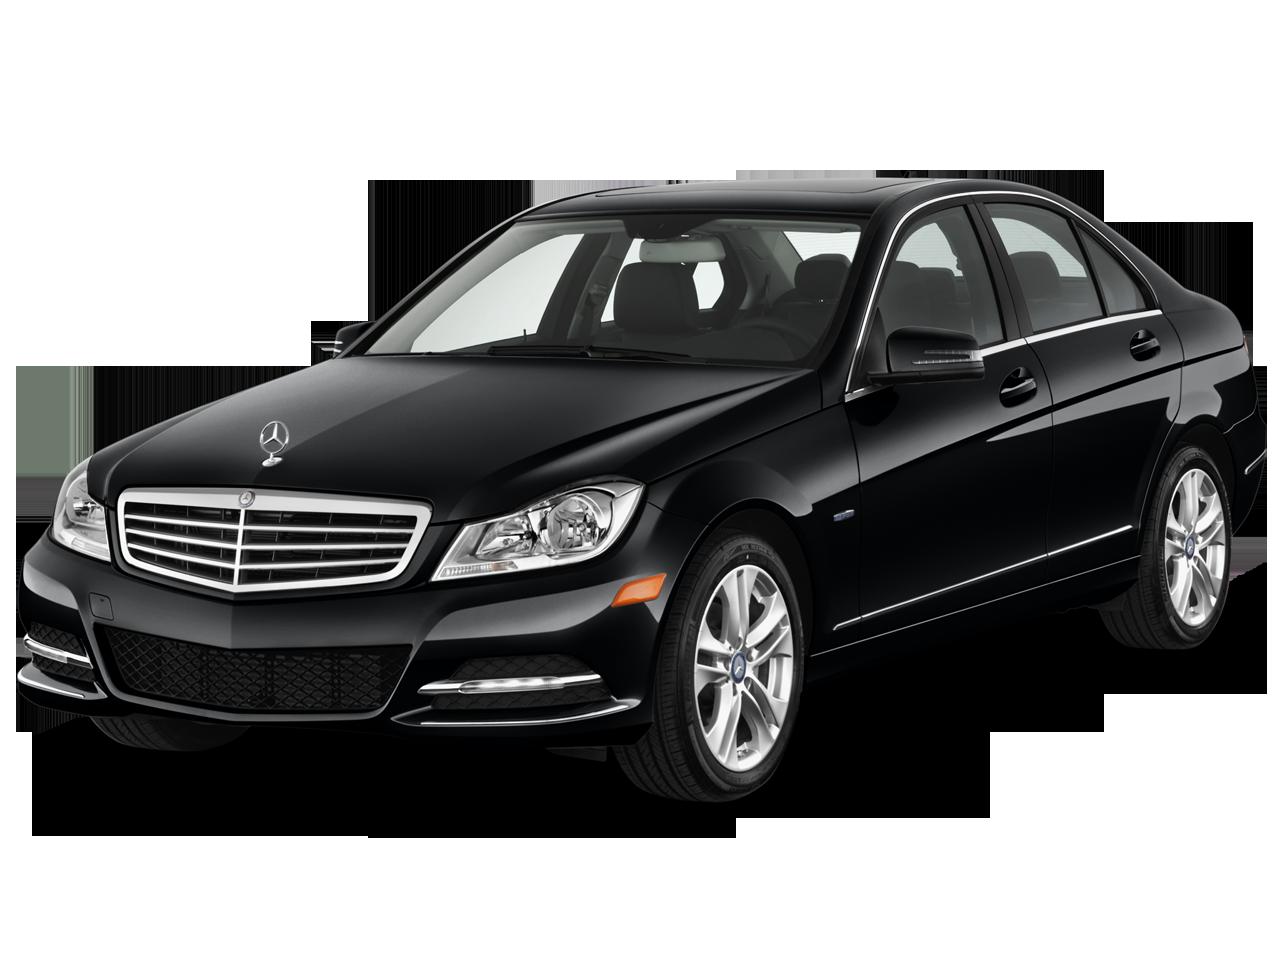 Mercedes car png image. Clipart cars psd